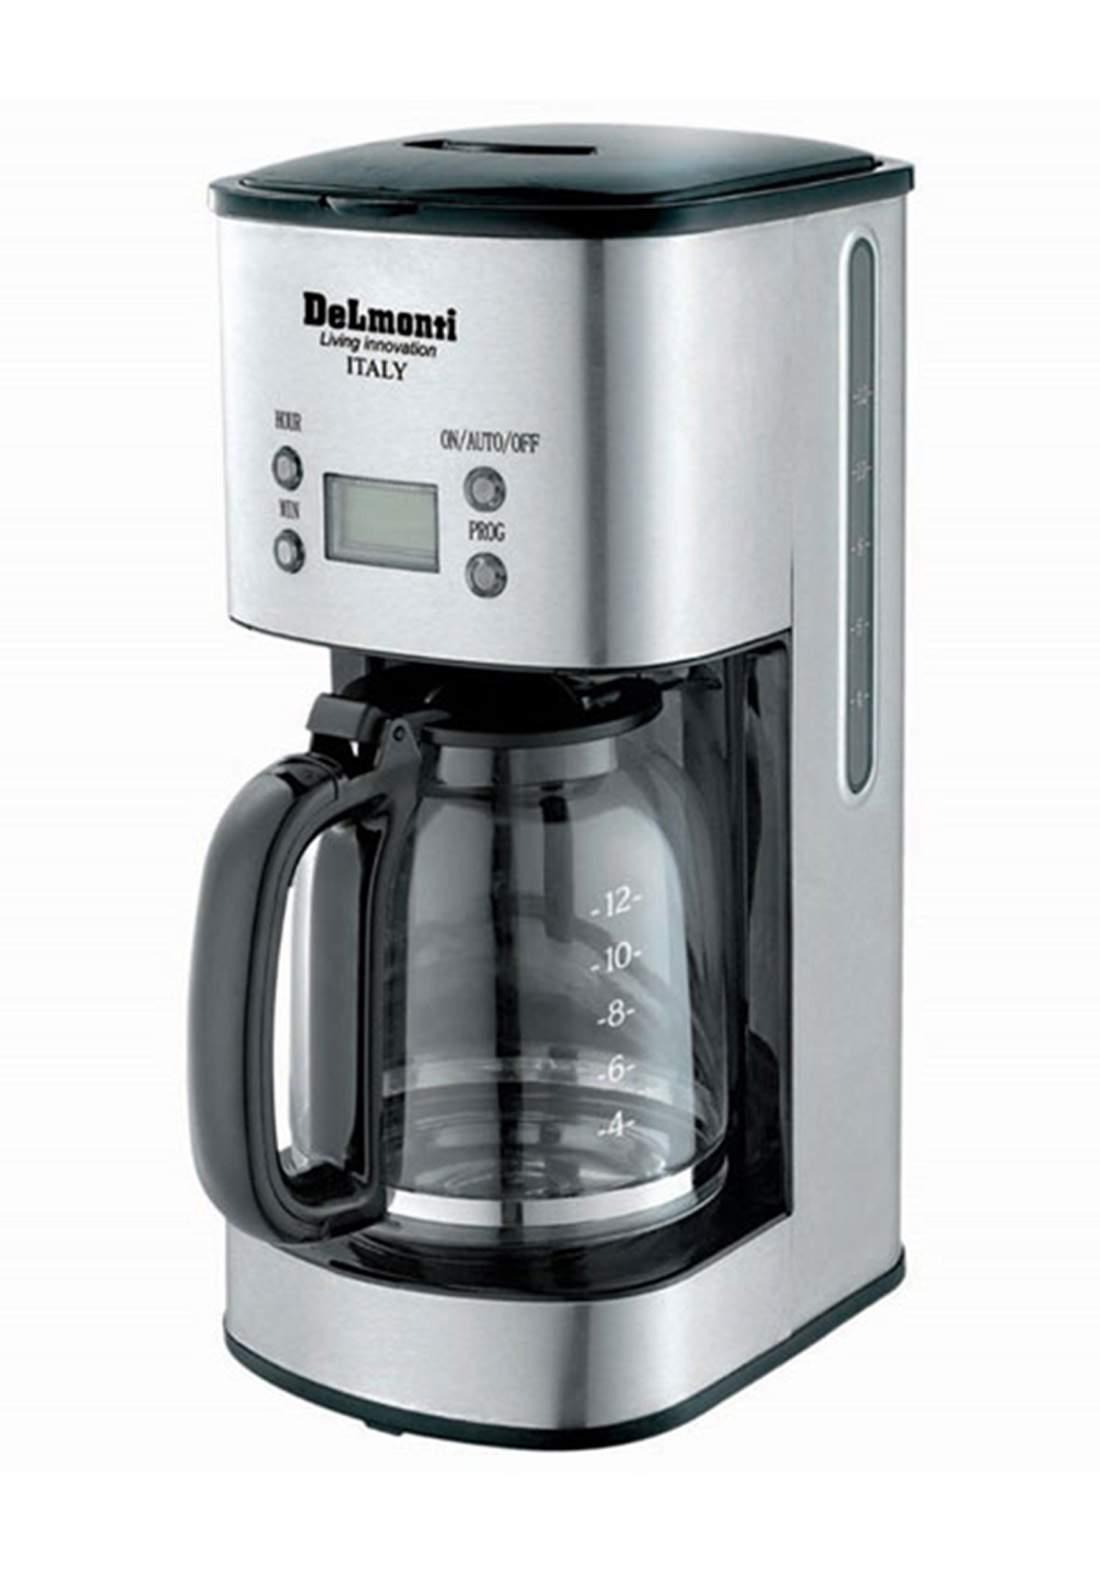 Delmonti DL 650Digital coffee makerماكنة صنع قهوة الرقمية